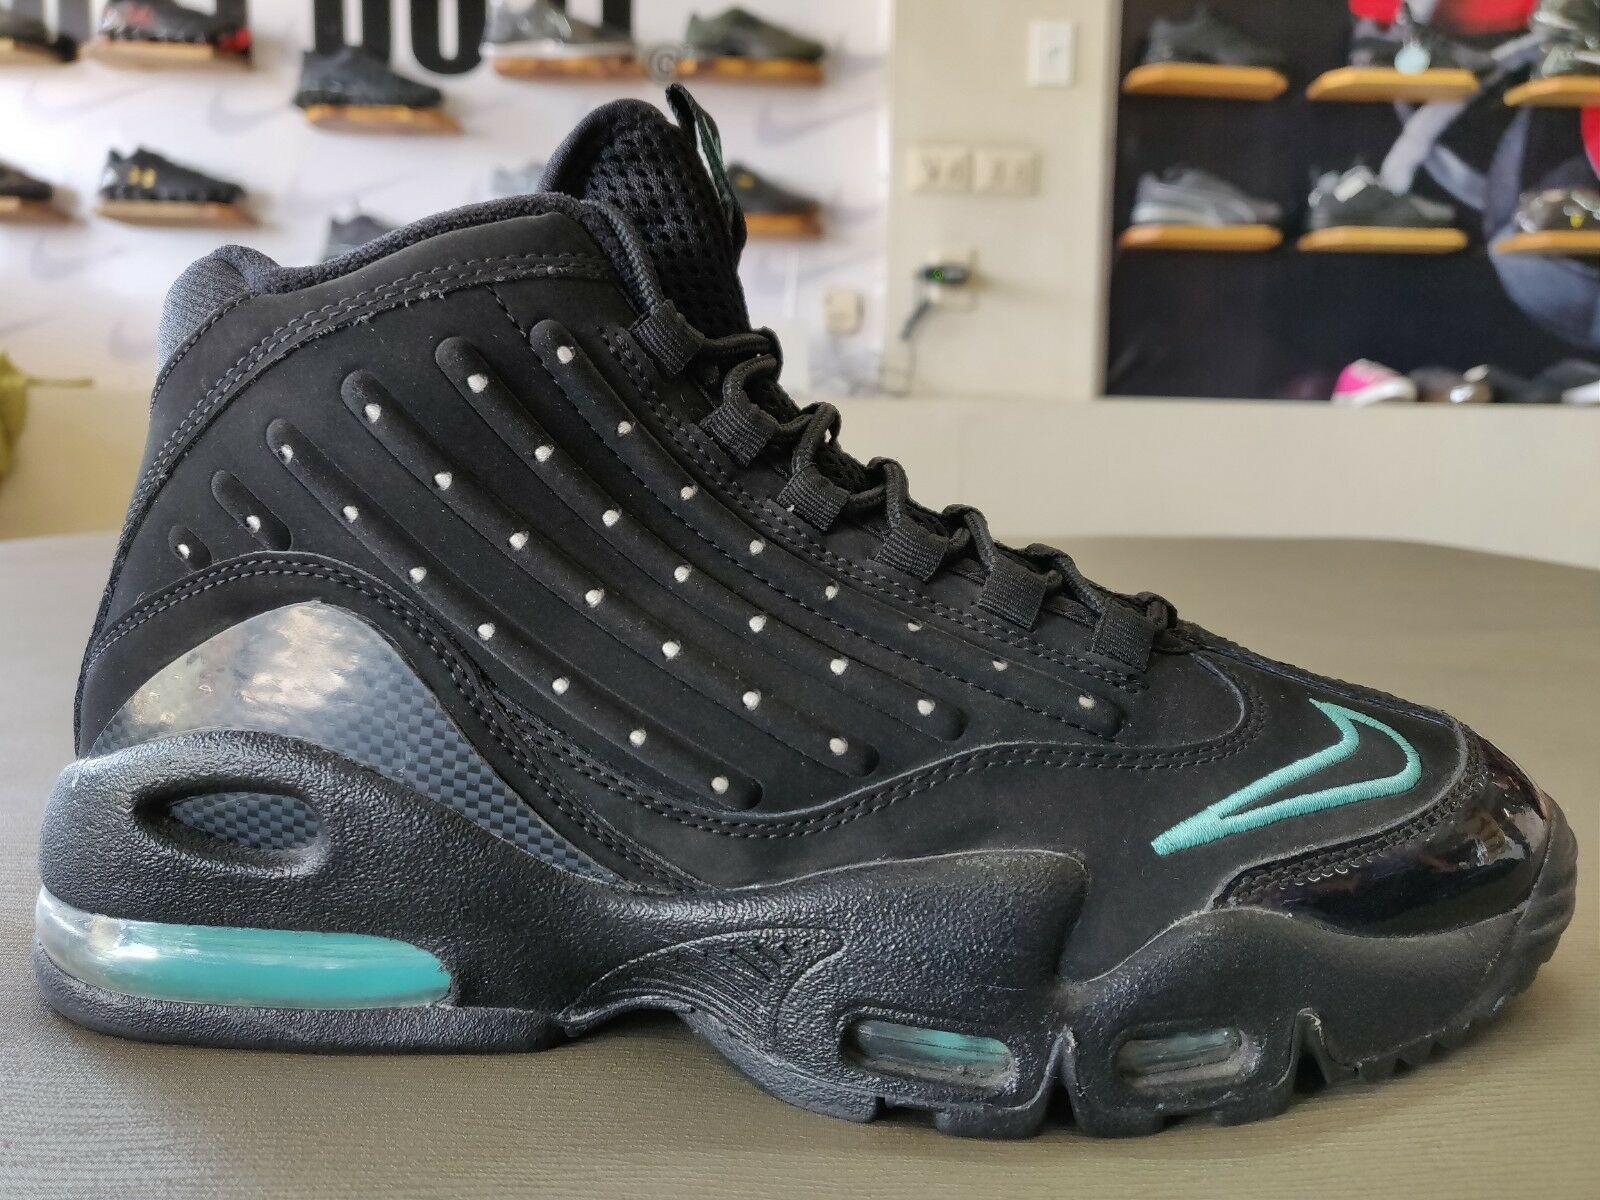 Para hombres Nike Air Griffey Max Jade II (2)  Negro Jade Max (4421720182) EE. UU. 550614